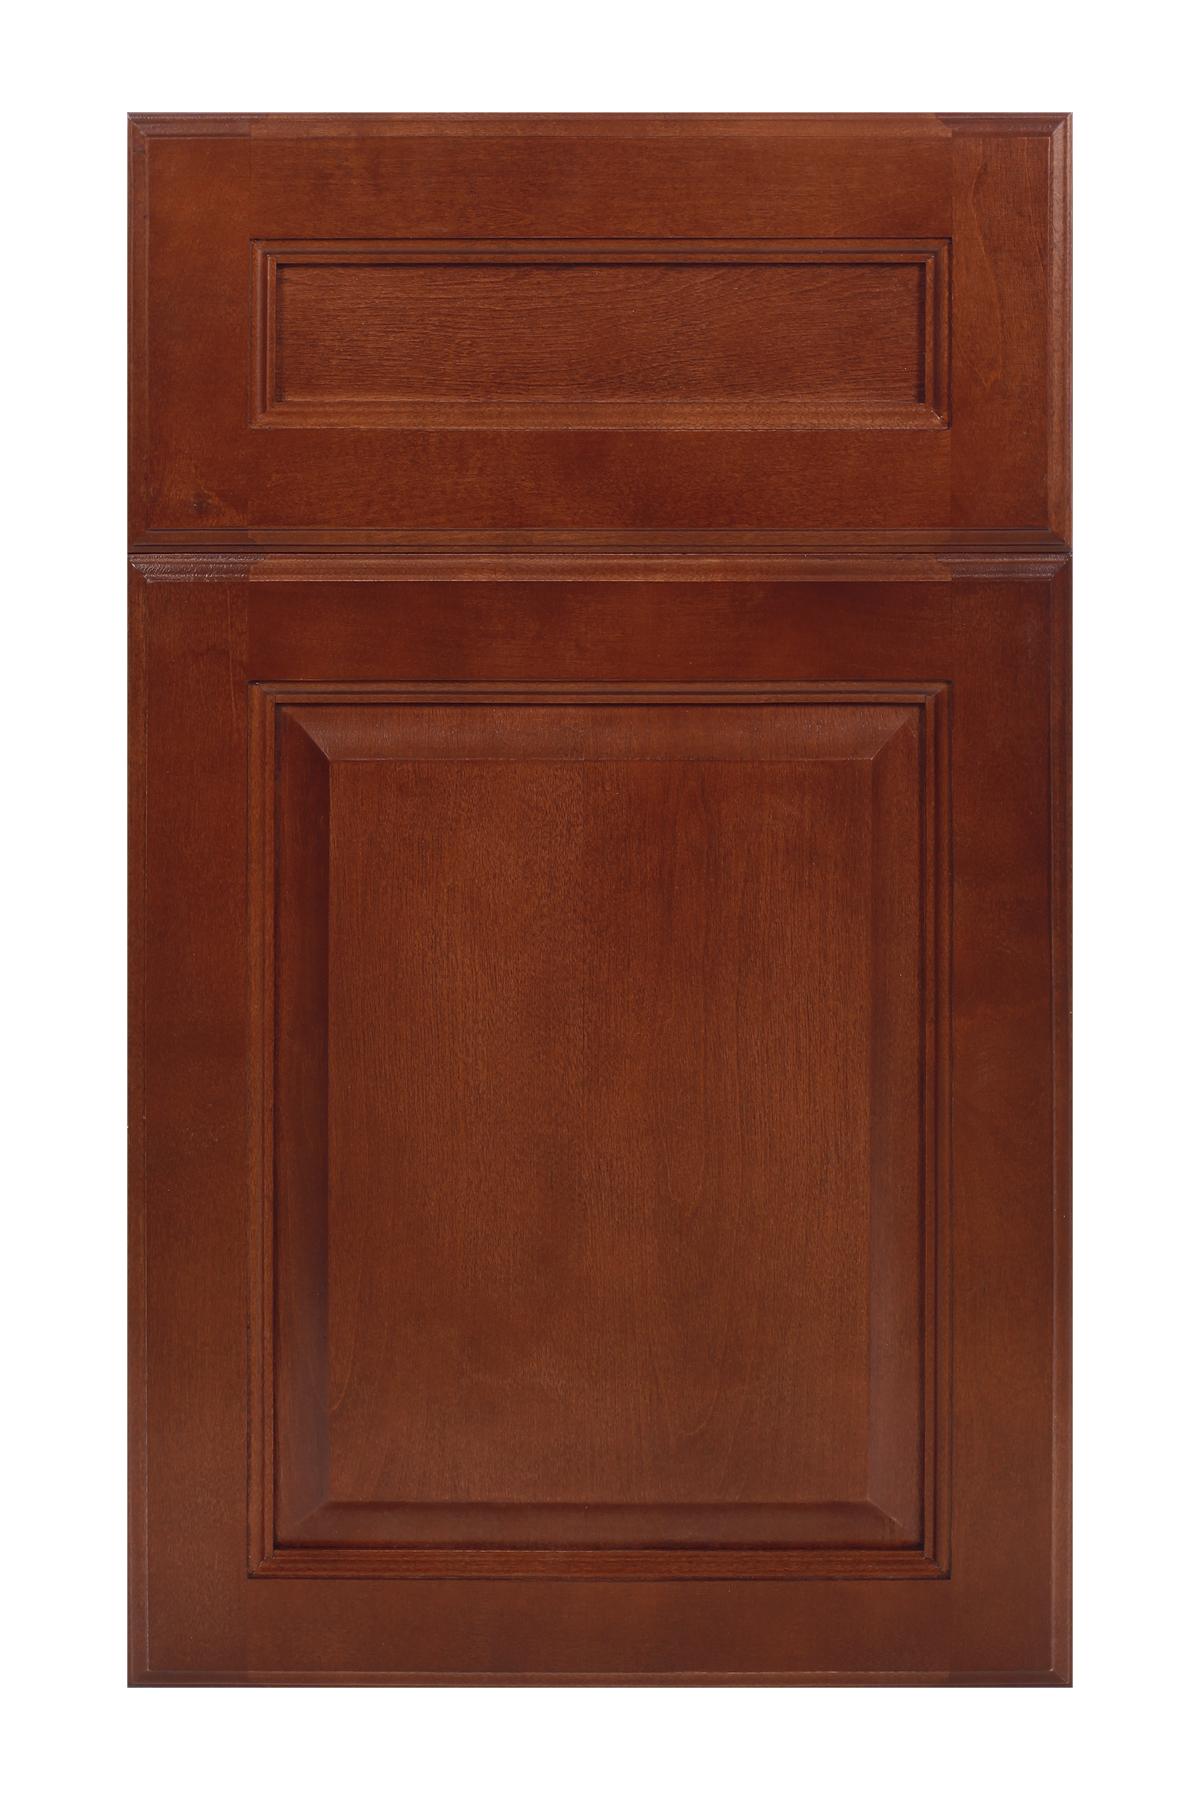 Hallmark Brandy — 75 Cabinets